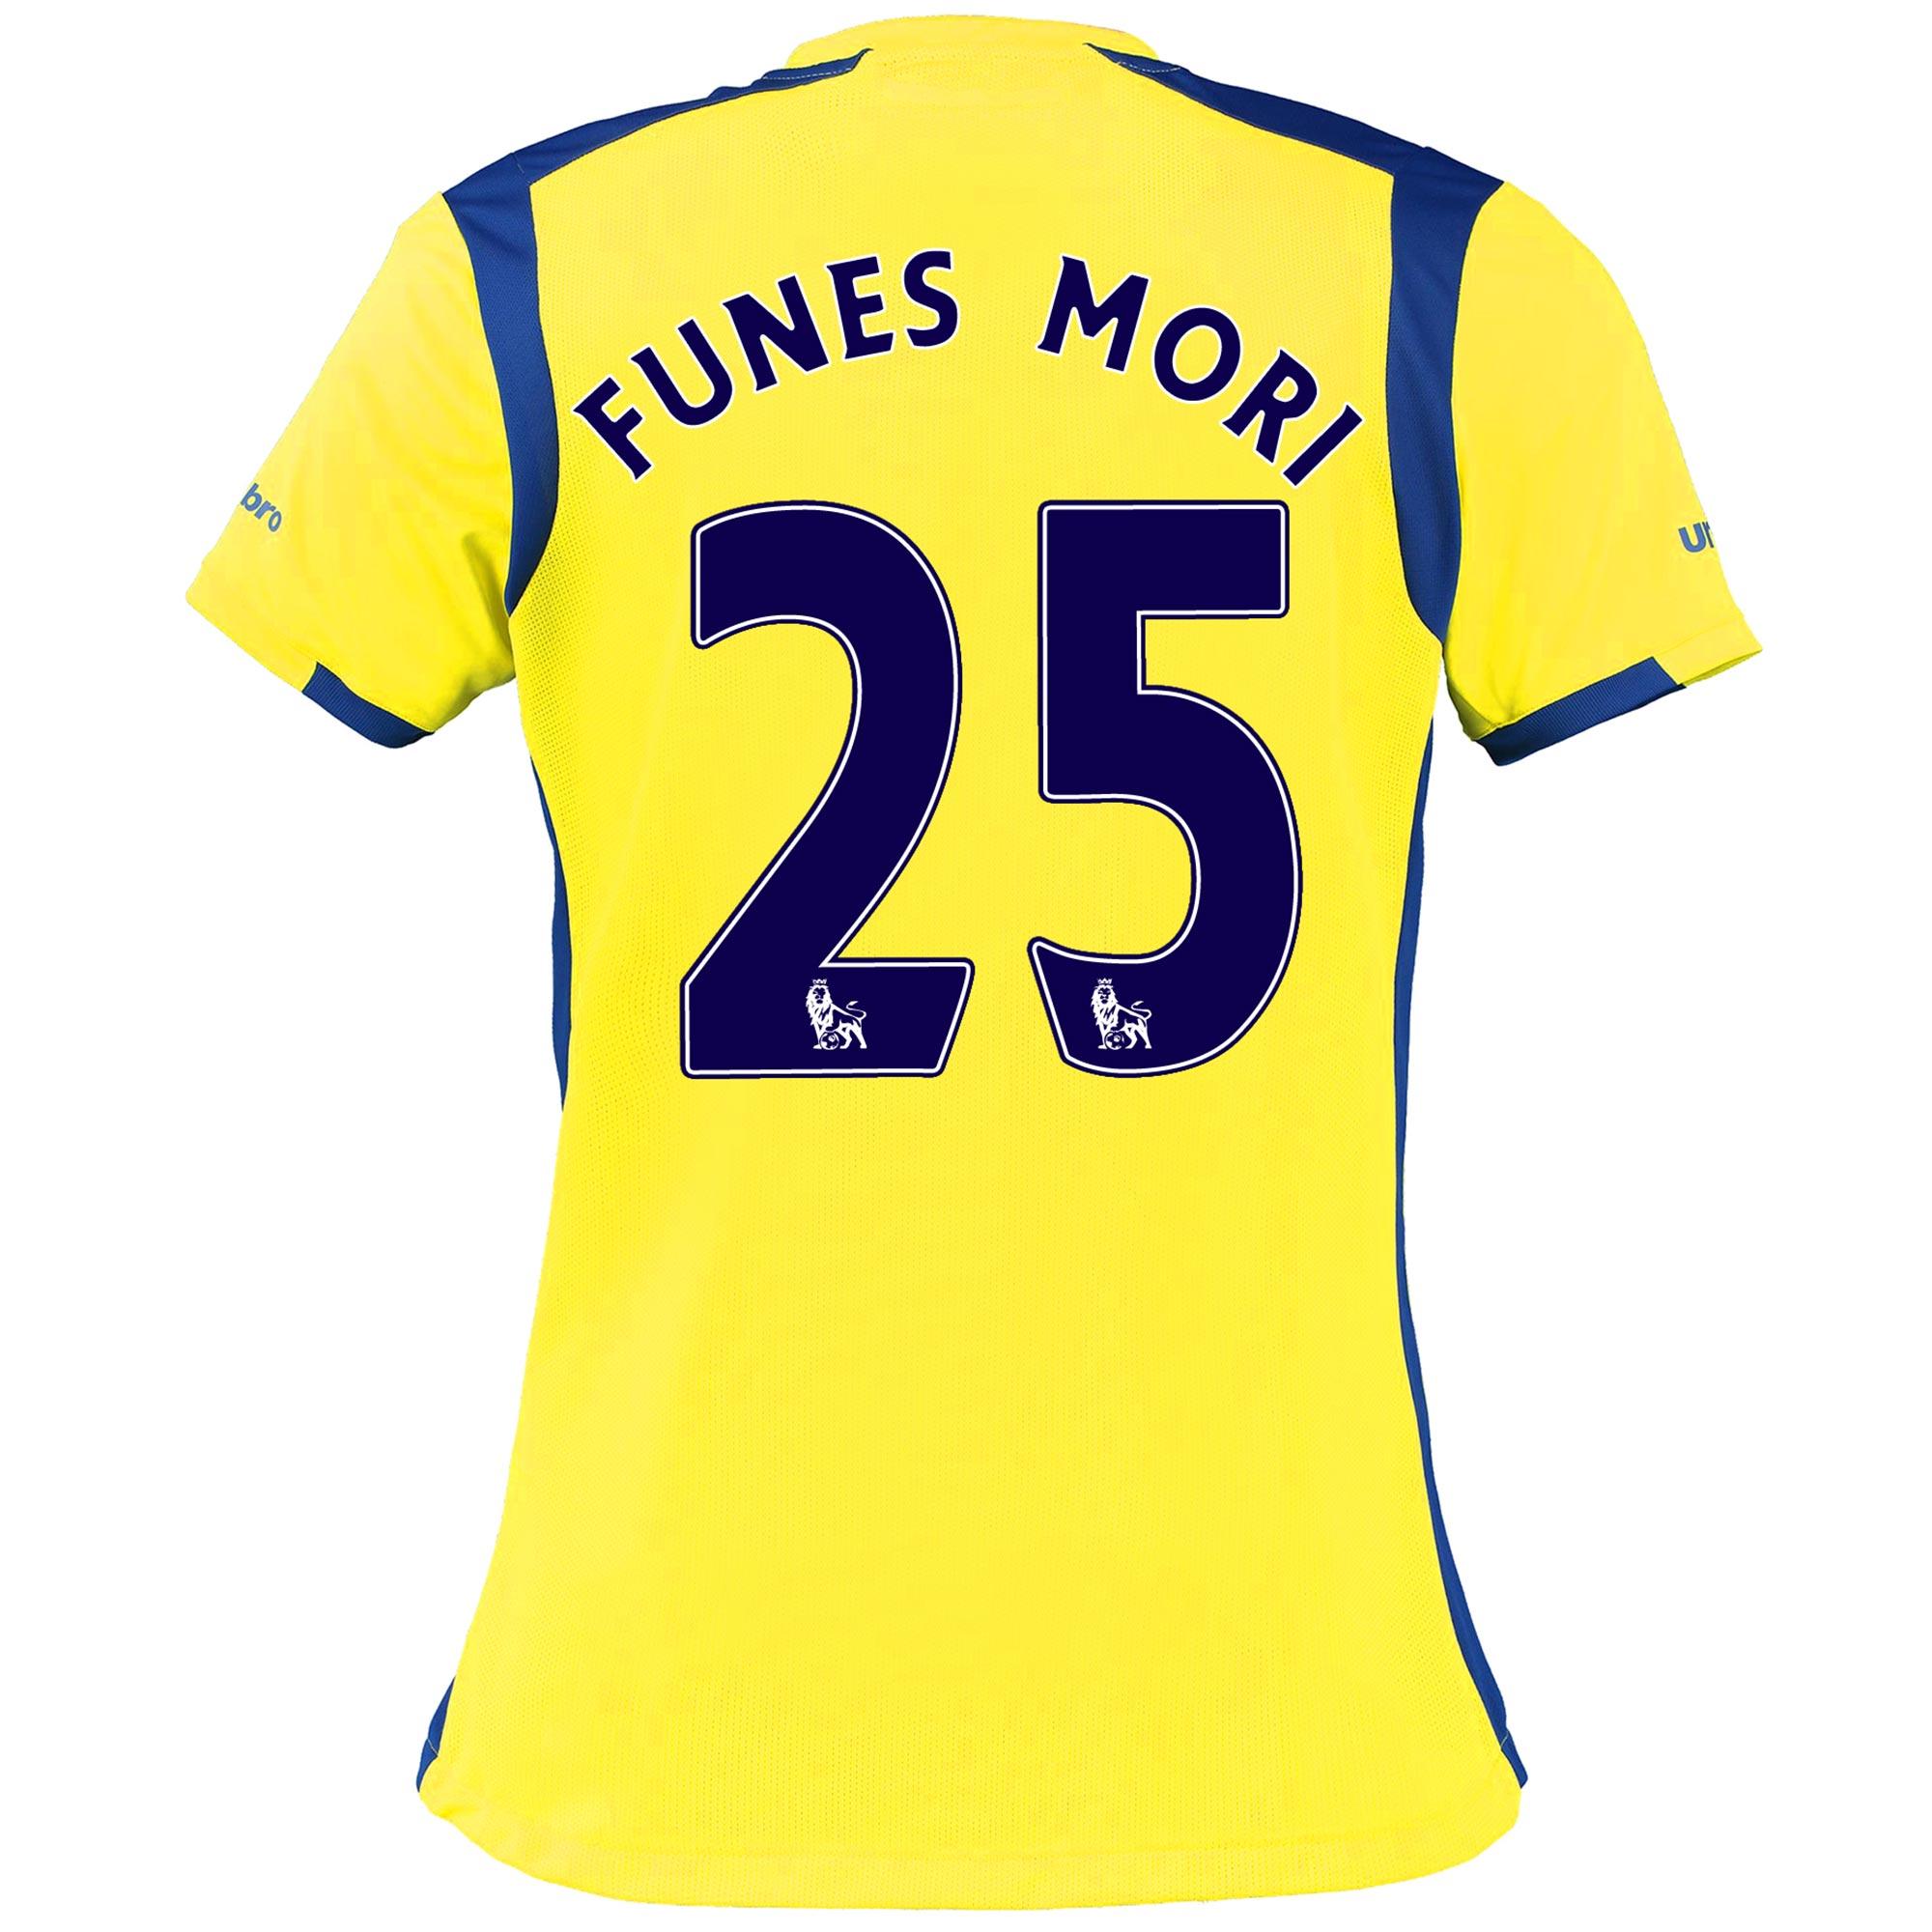 Everton 3rd Shirt 2016/17 - Womens with Funes Mori 25 printing